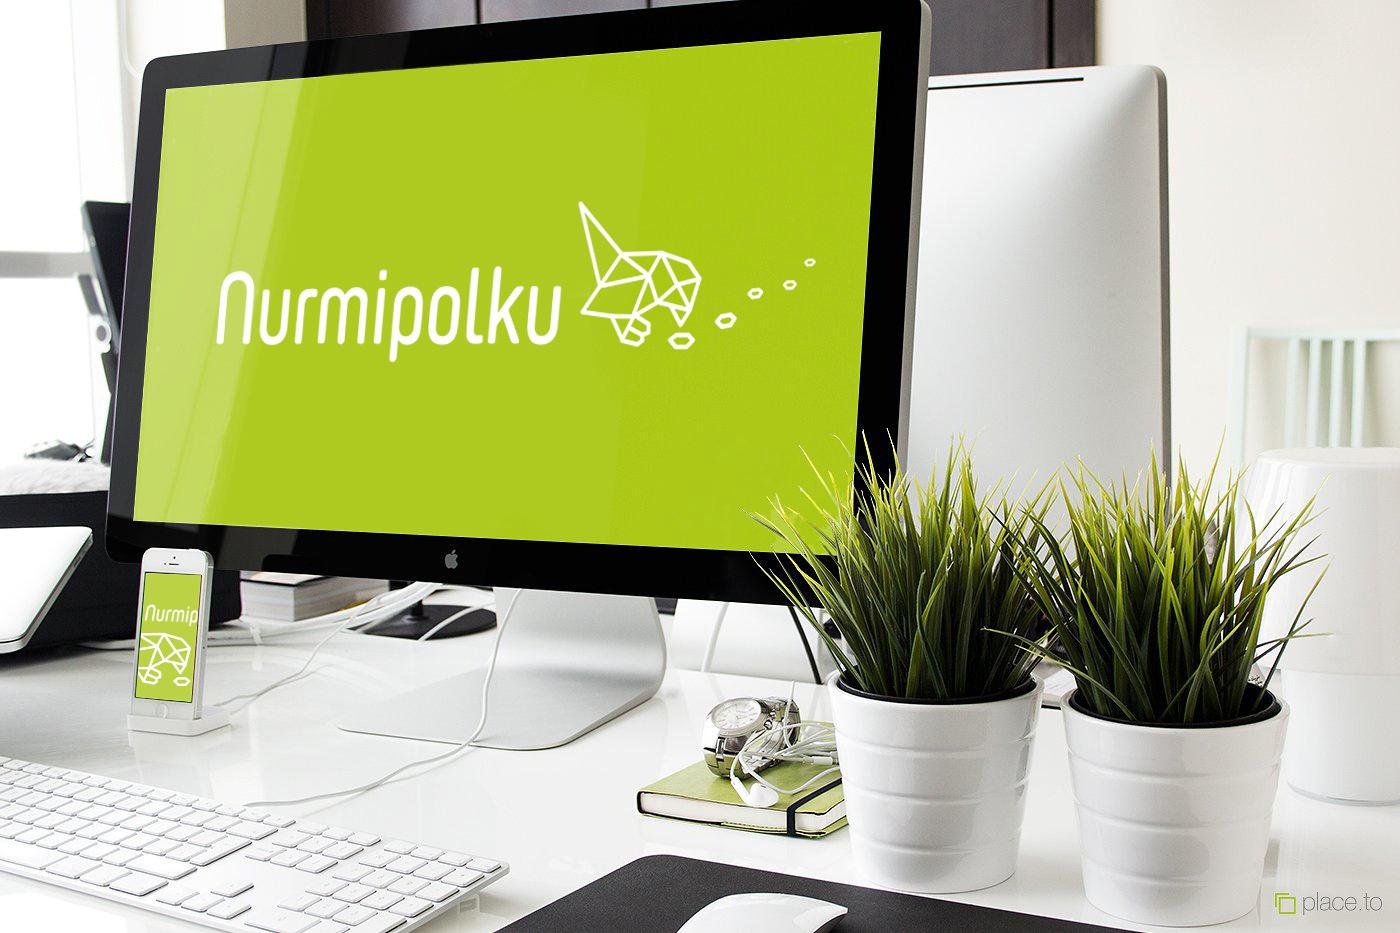 Nurmipolku logo